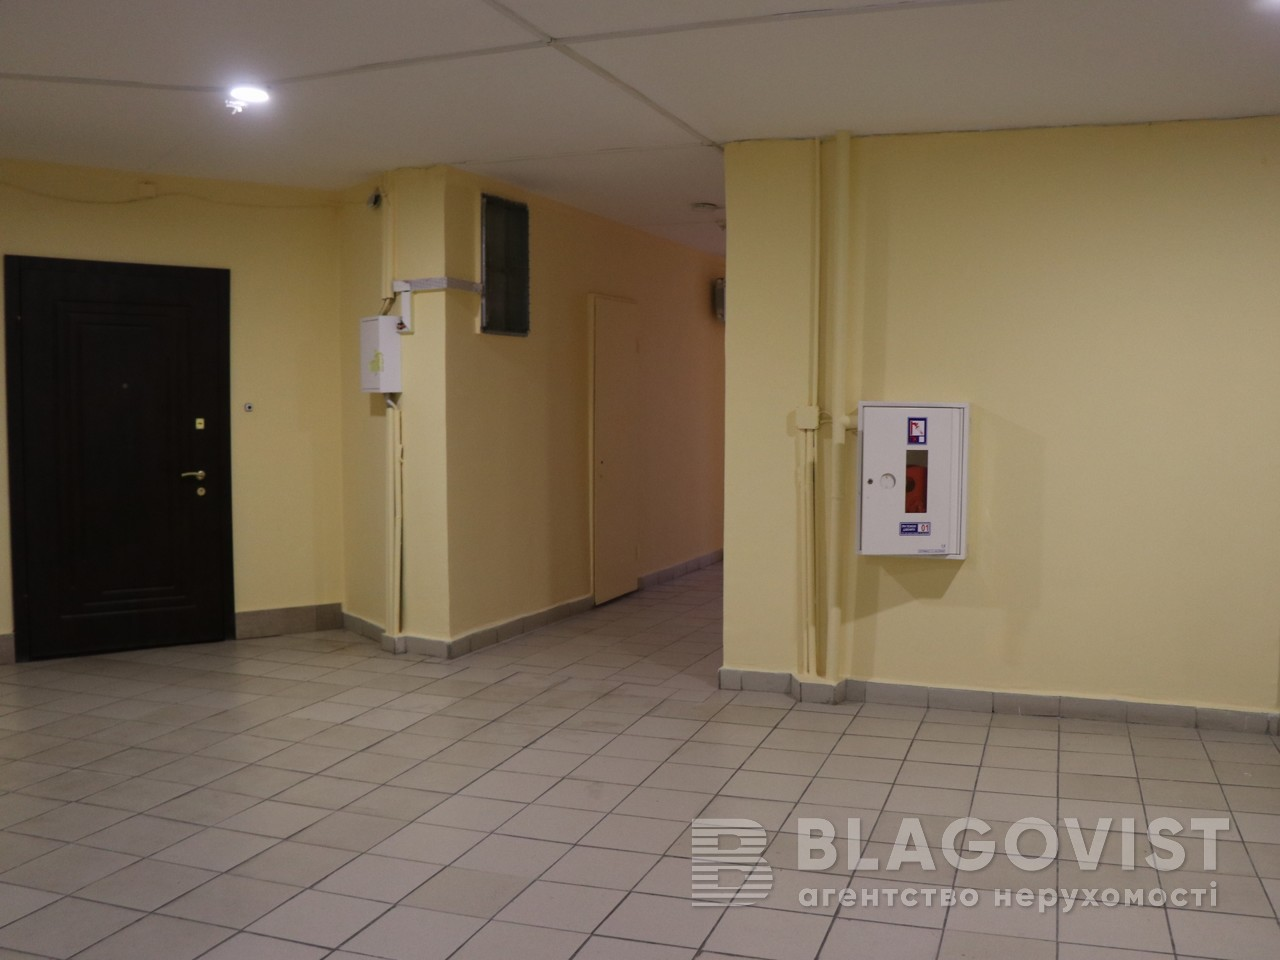 Нежилое помещение, Академика Палладина просп., Киев, P-27333 - Фото 26